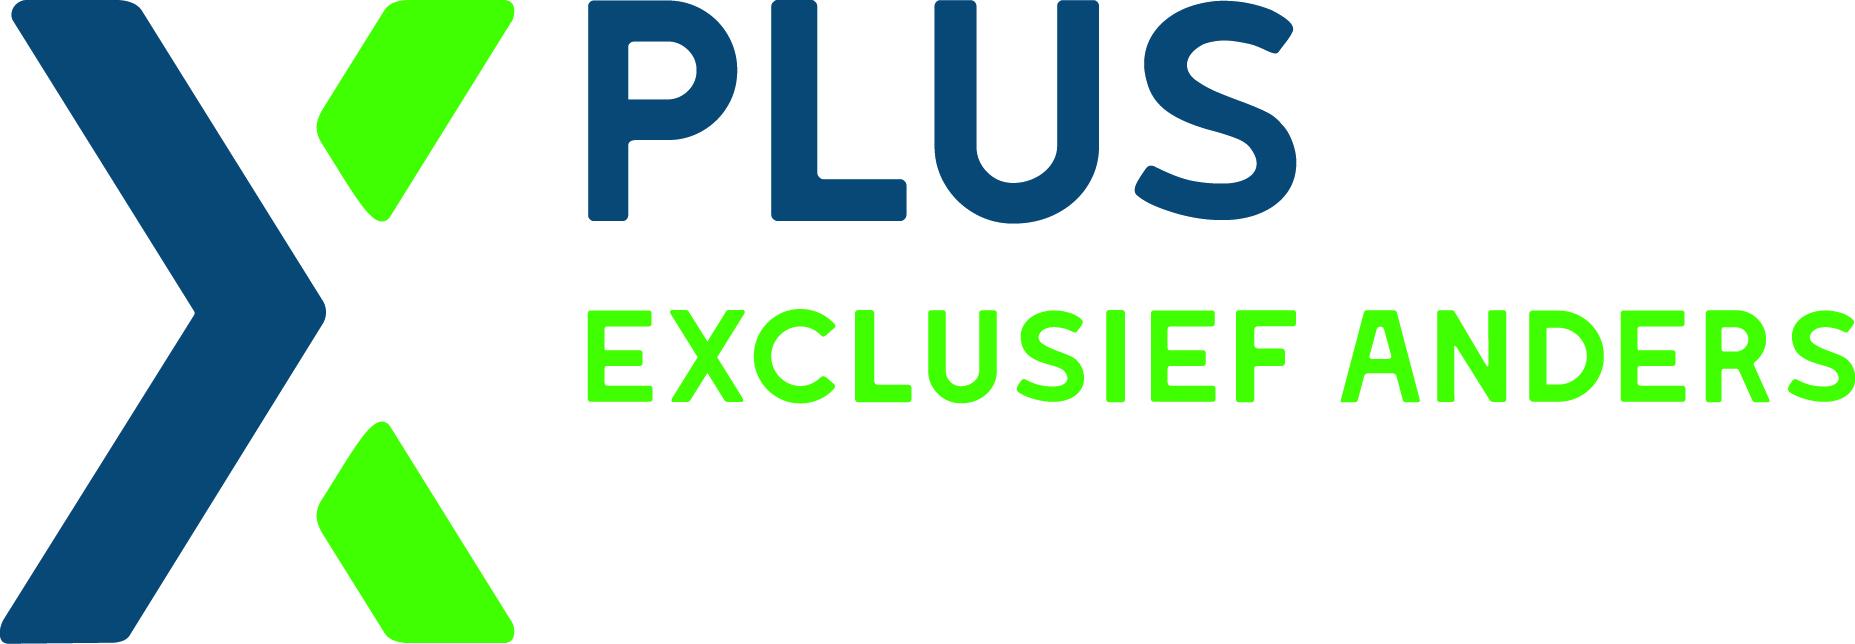 Platina XPLUS